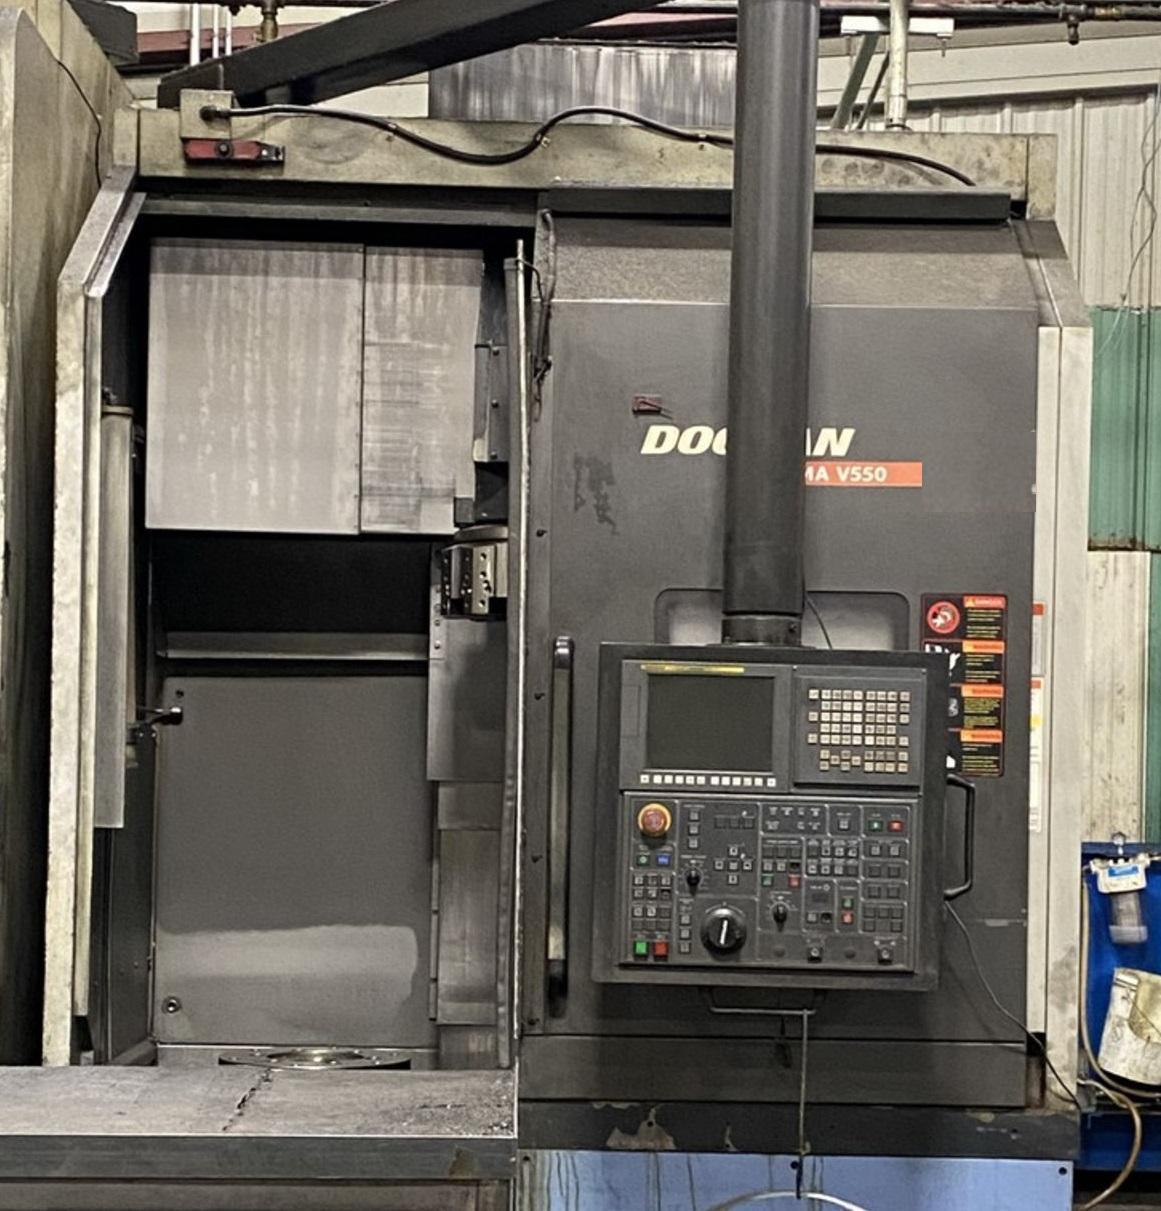 "Doosan Puma V550 CNC Vertical Lathe (2011), Fanuc i, 24"" Chuck, 31.5"" Swing, 50 HP, 12 Position Turret, 2000 RPM, 15.3""/30.7"" Travels"